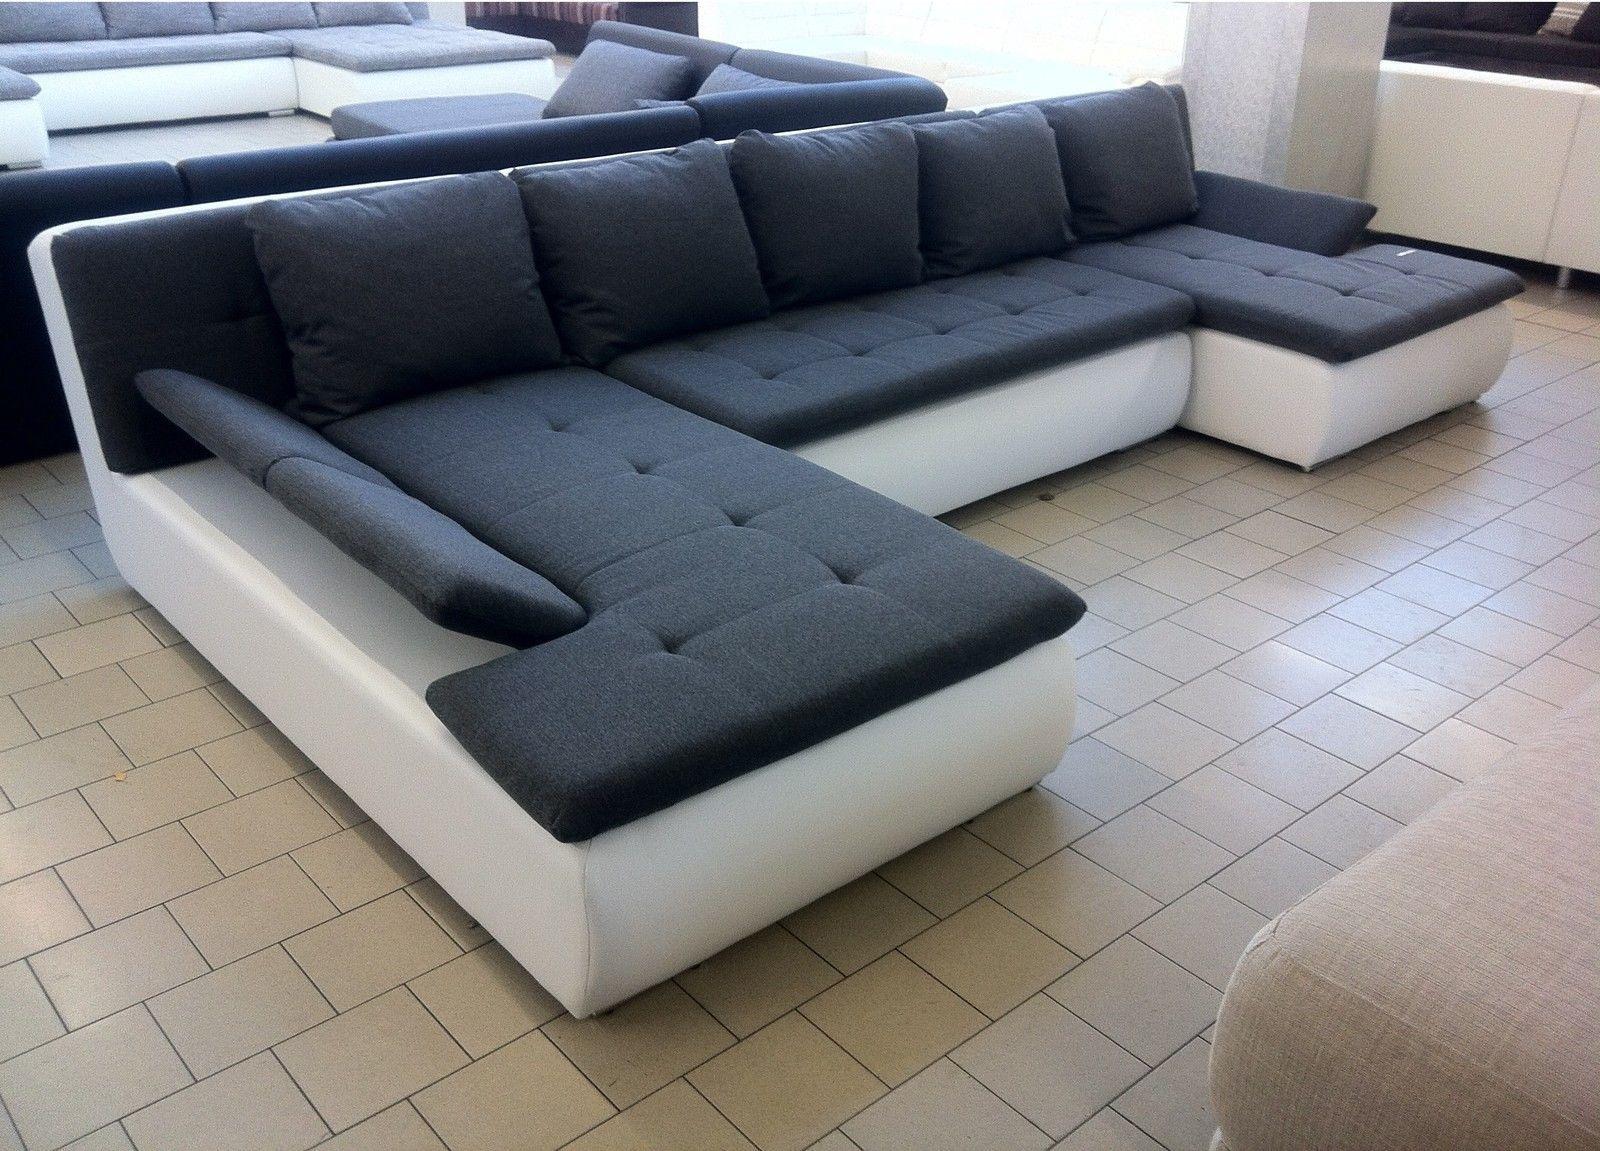 71 Minimalist Schone Gunstige Couch Dengan Gambar